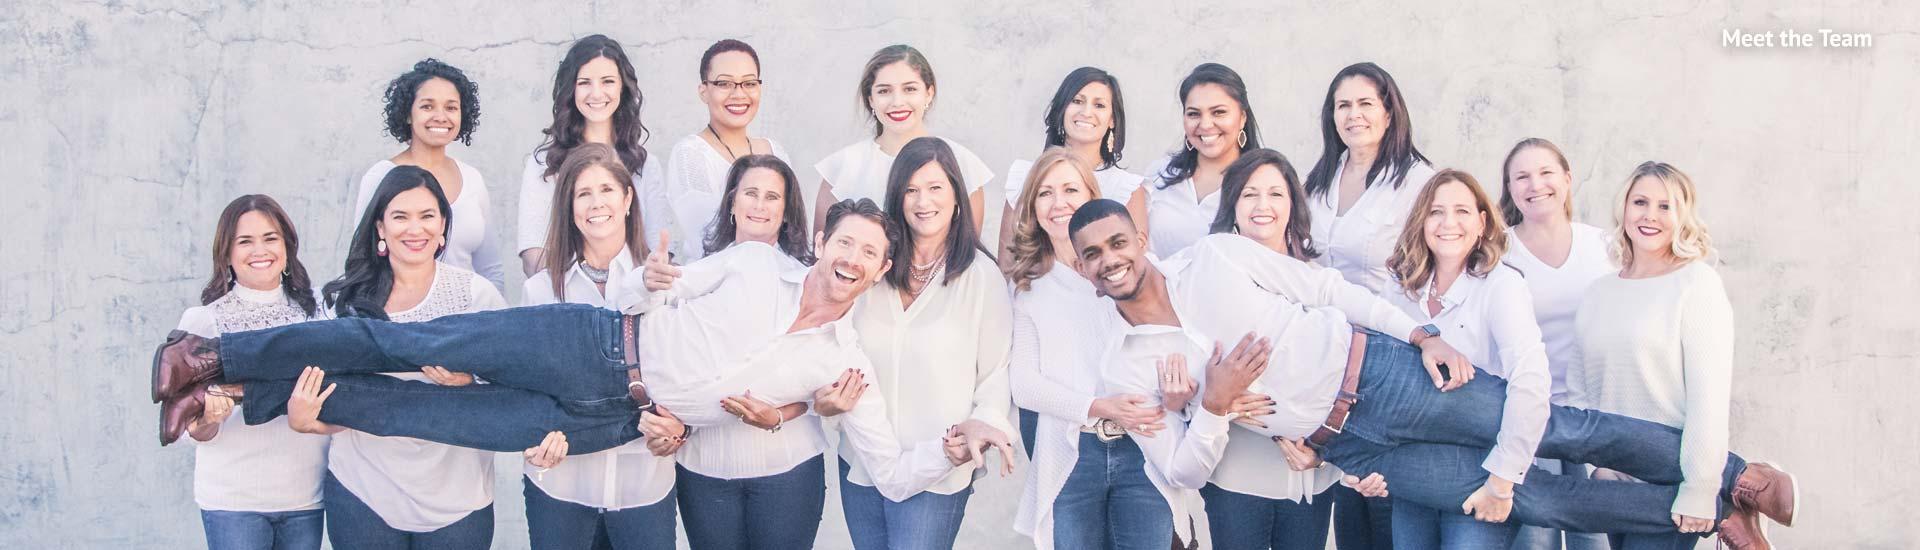 Meet the team Stone Oak Orthodontics San Antonio TX